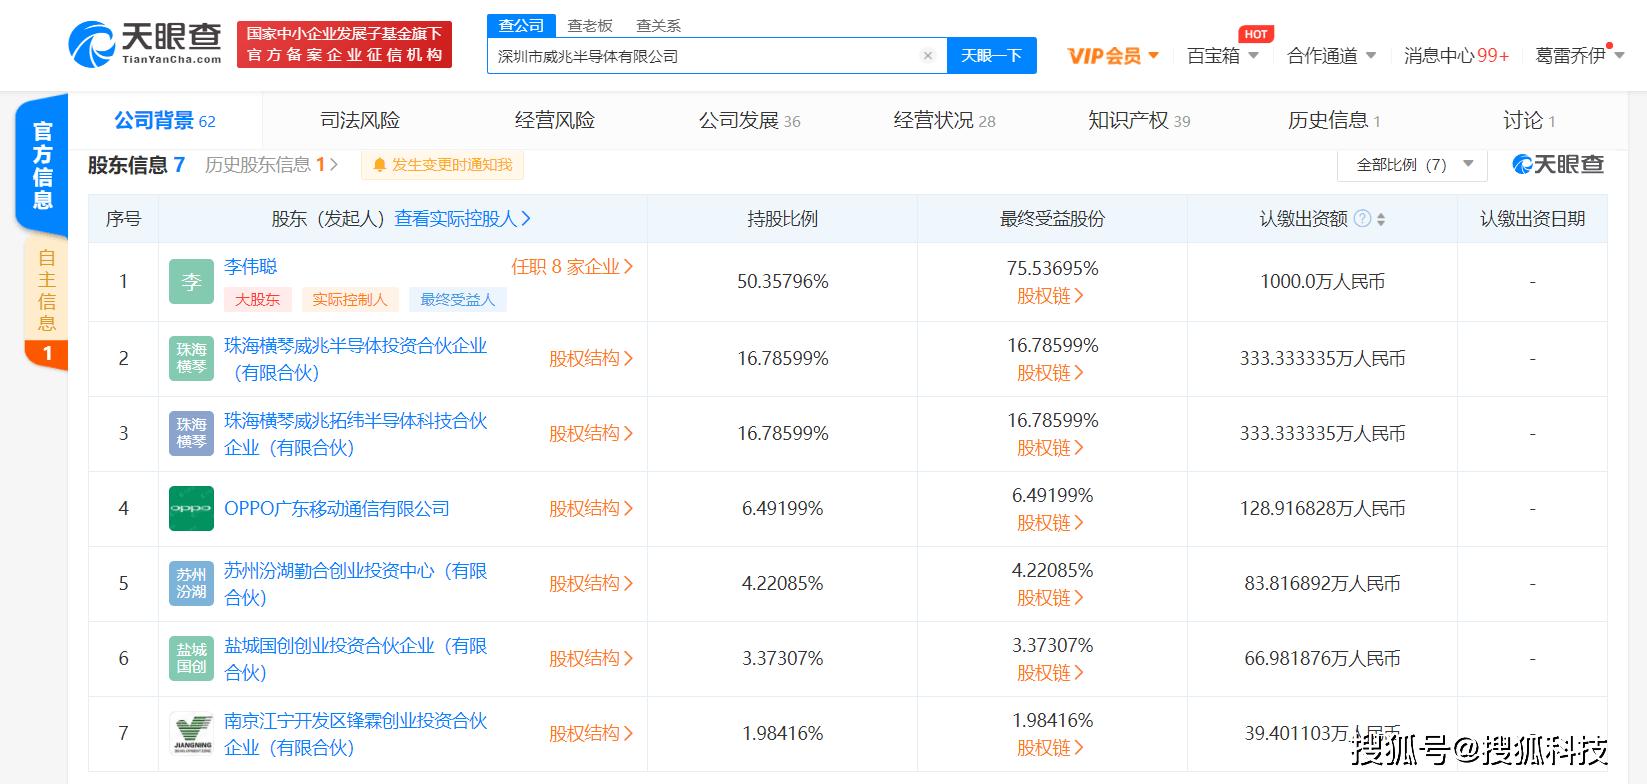 OPPO关联公司入股深圳市威兆半导体有限公司